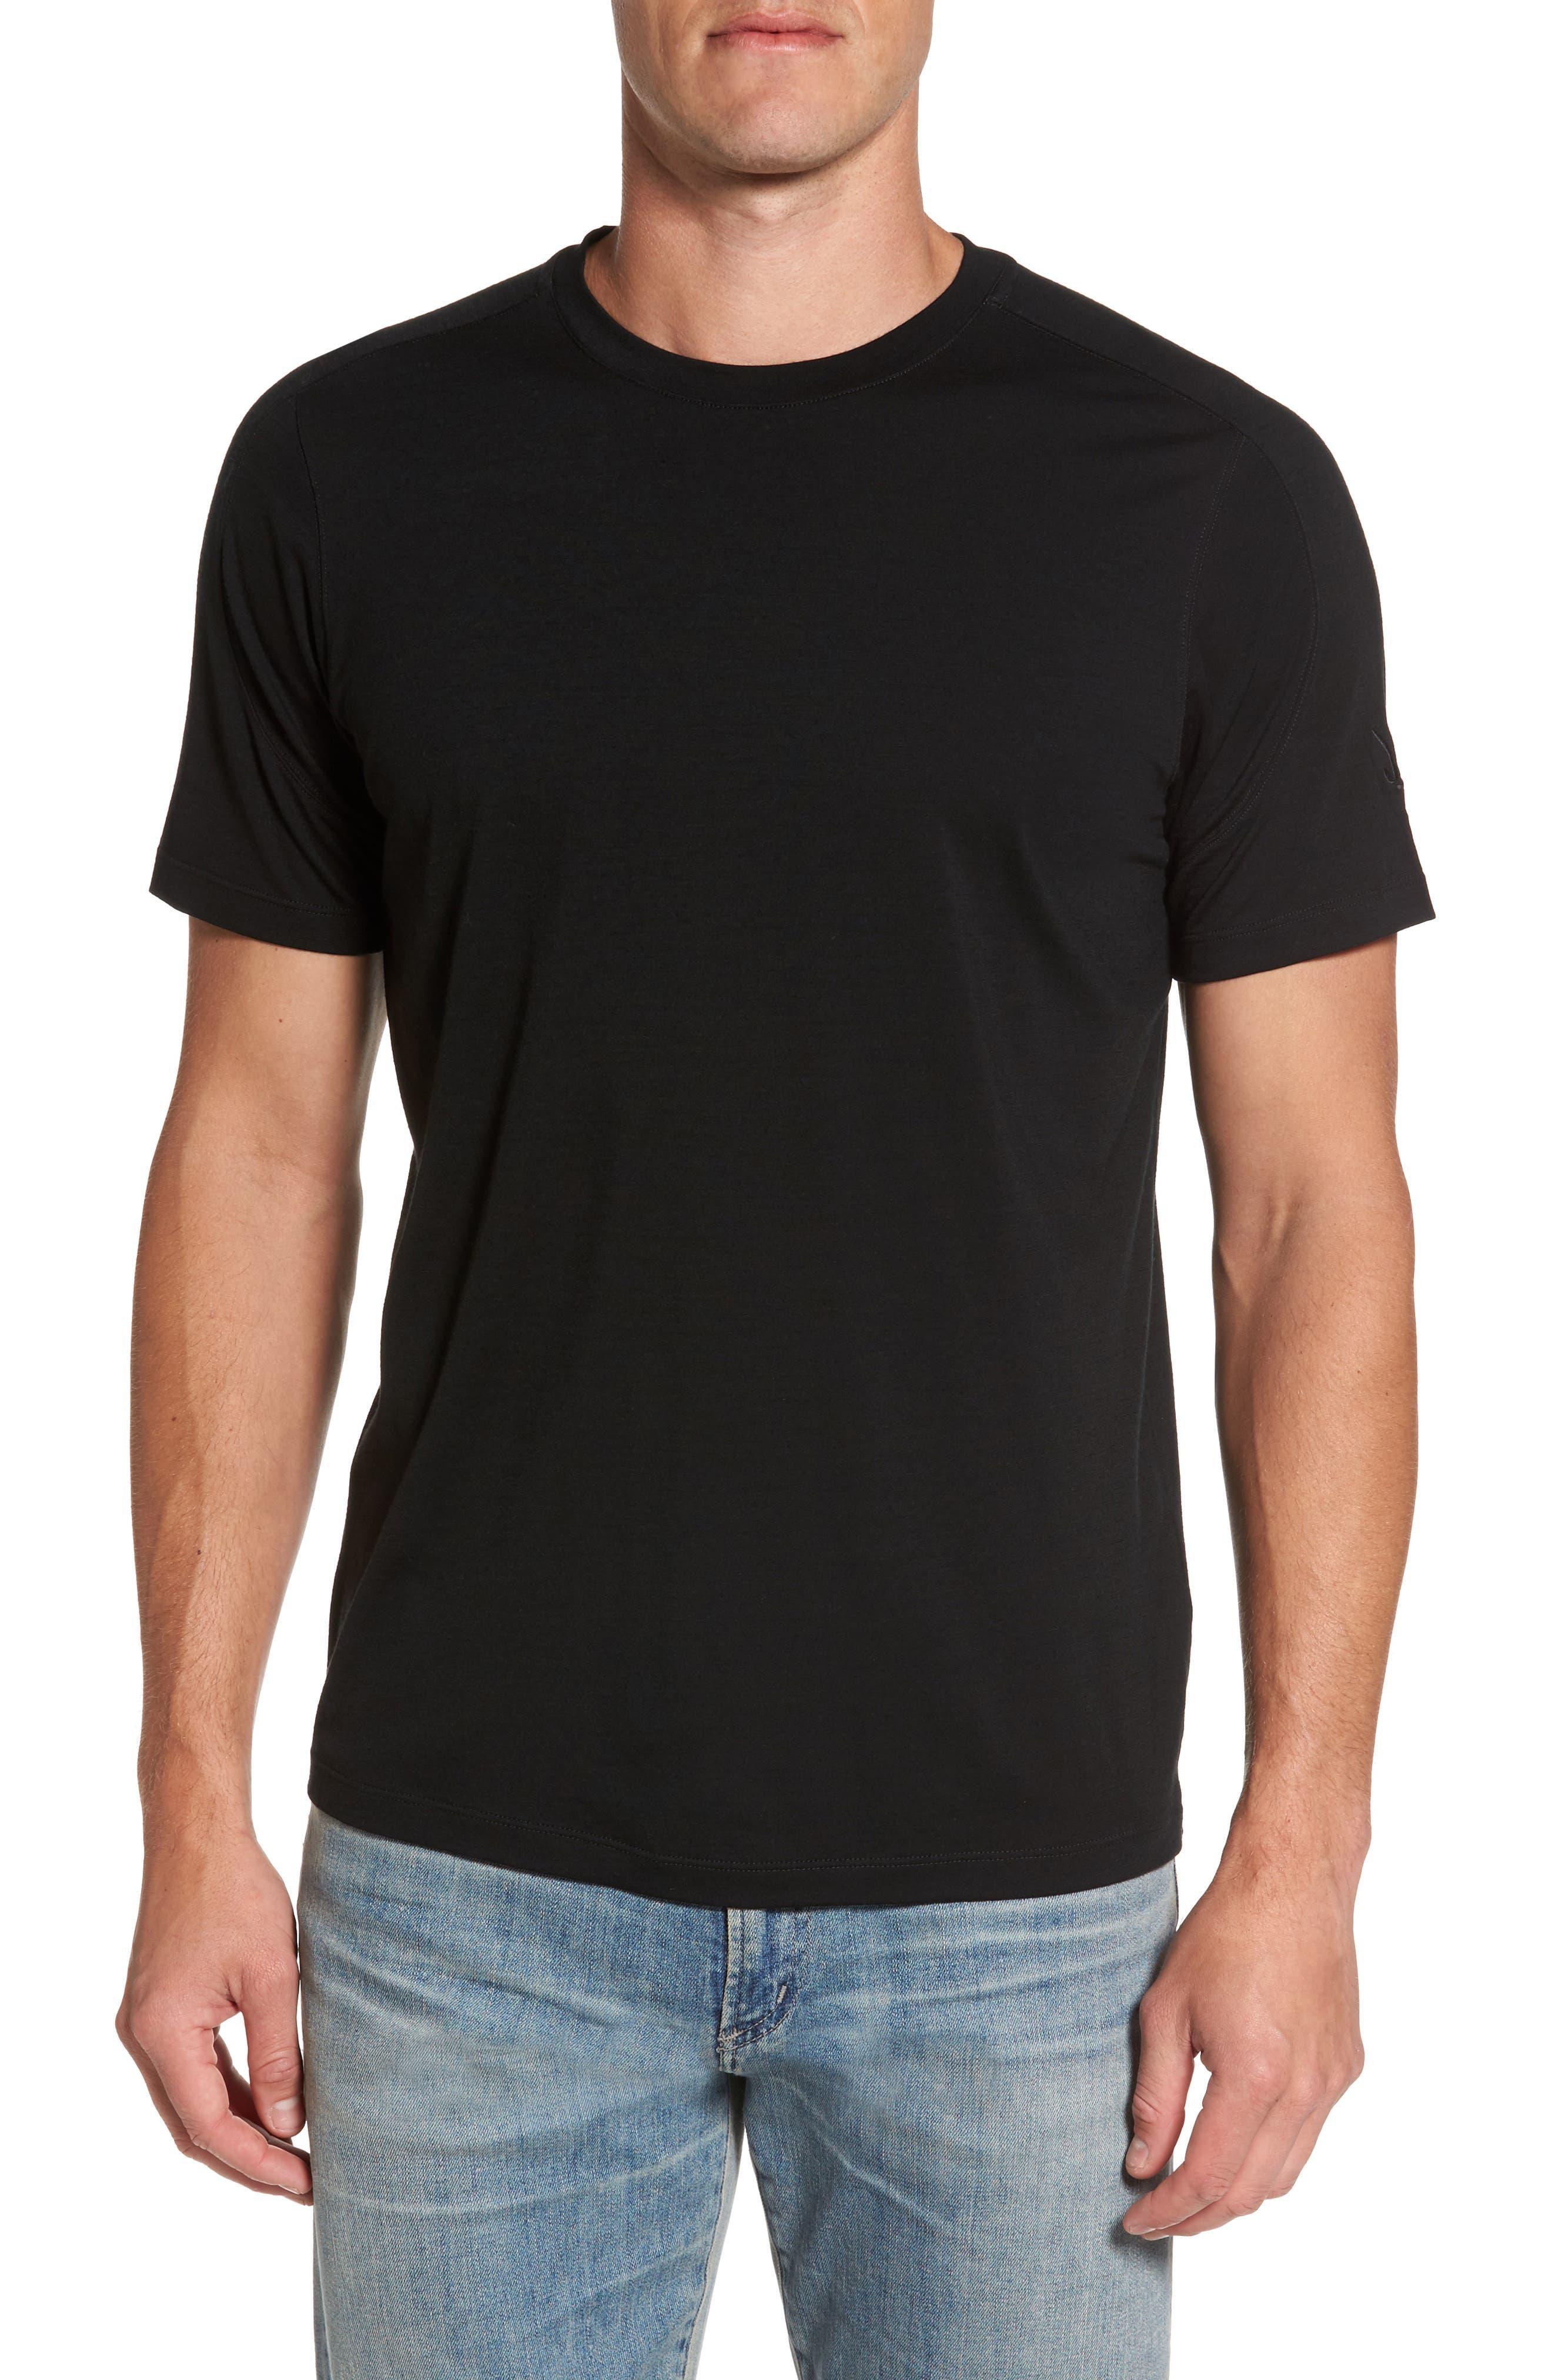 Odyssey T-Shirt,                         Main,                         color, Black